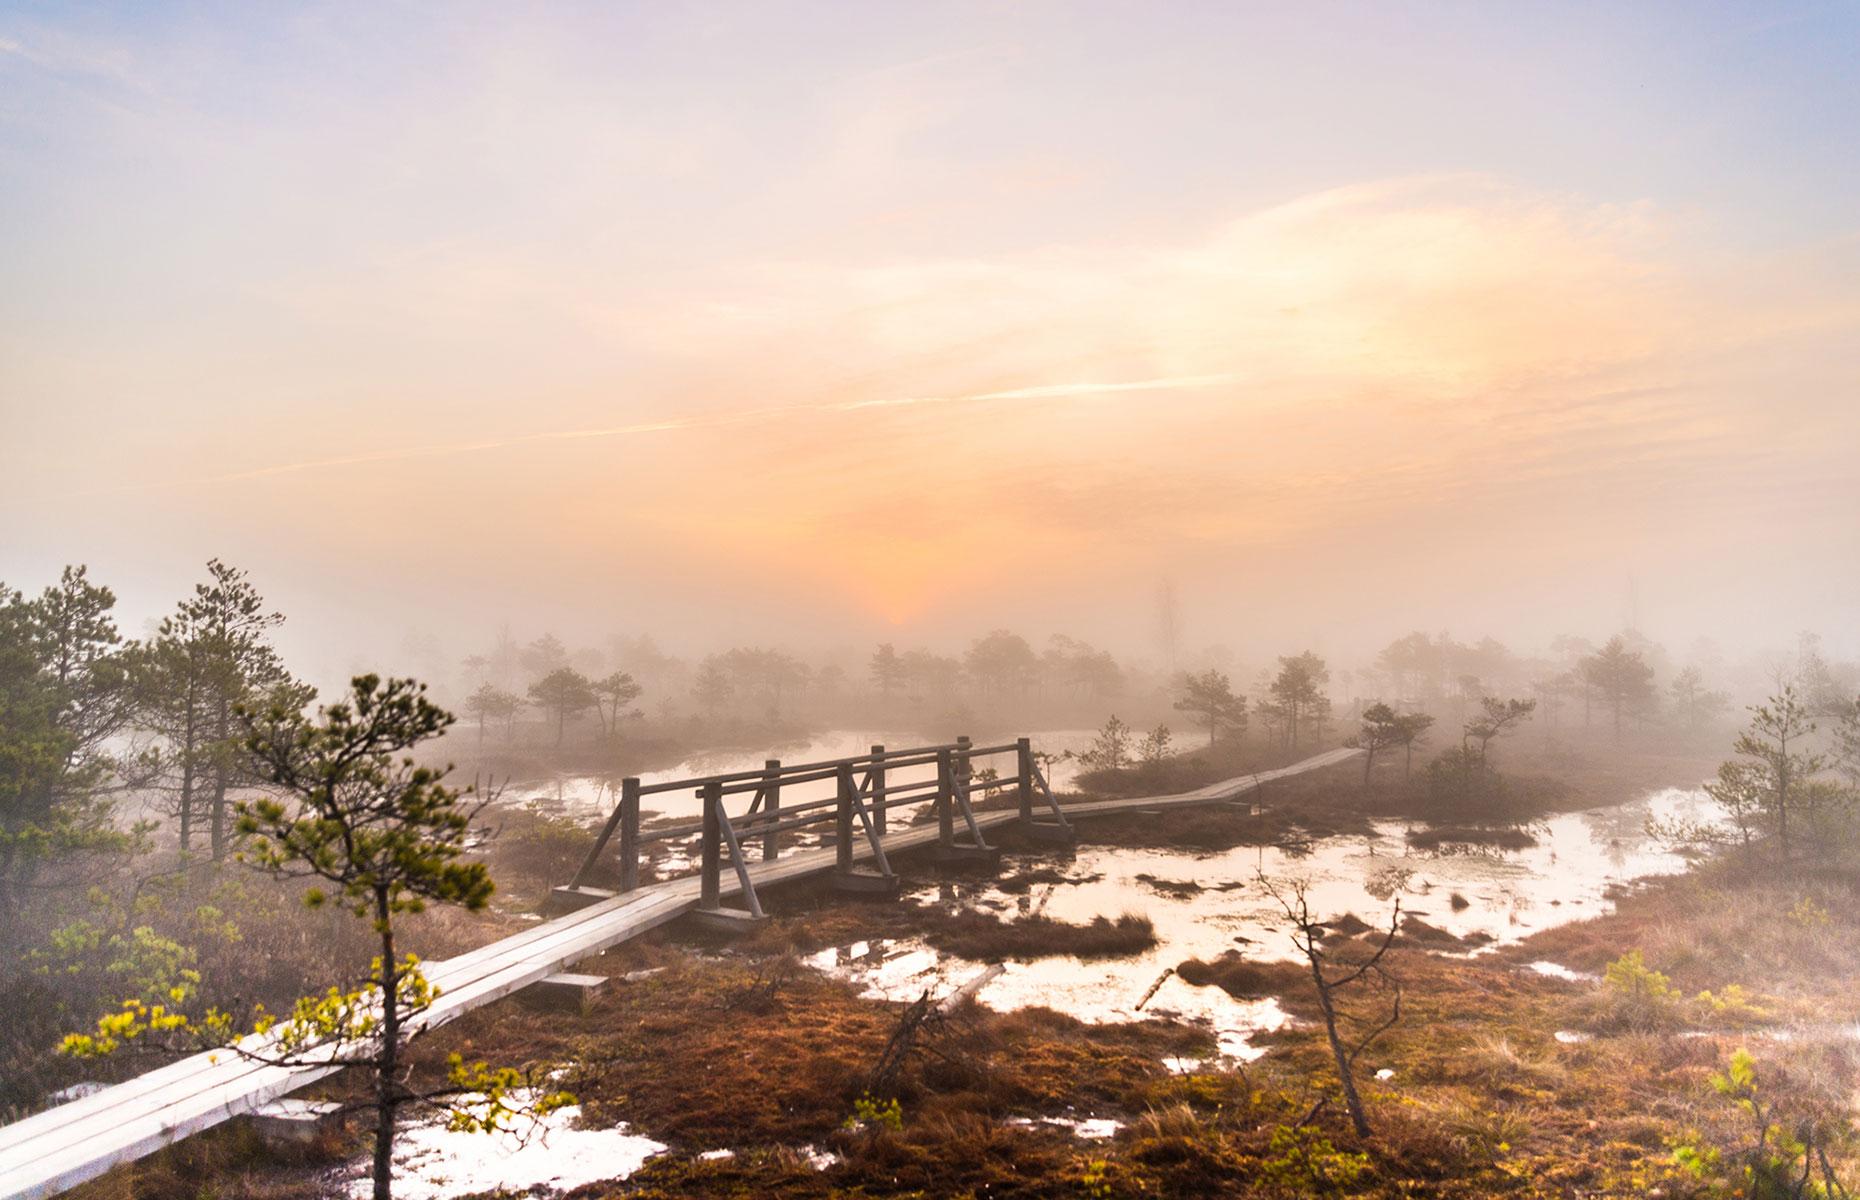 Sunrise at Kemeri, Latvia (Image: mdbildes/Shutterstock)